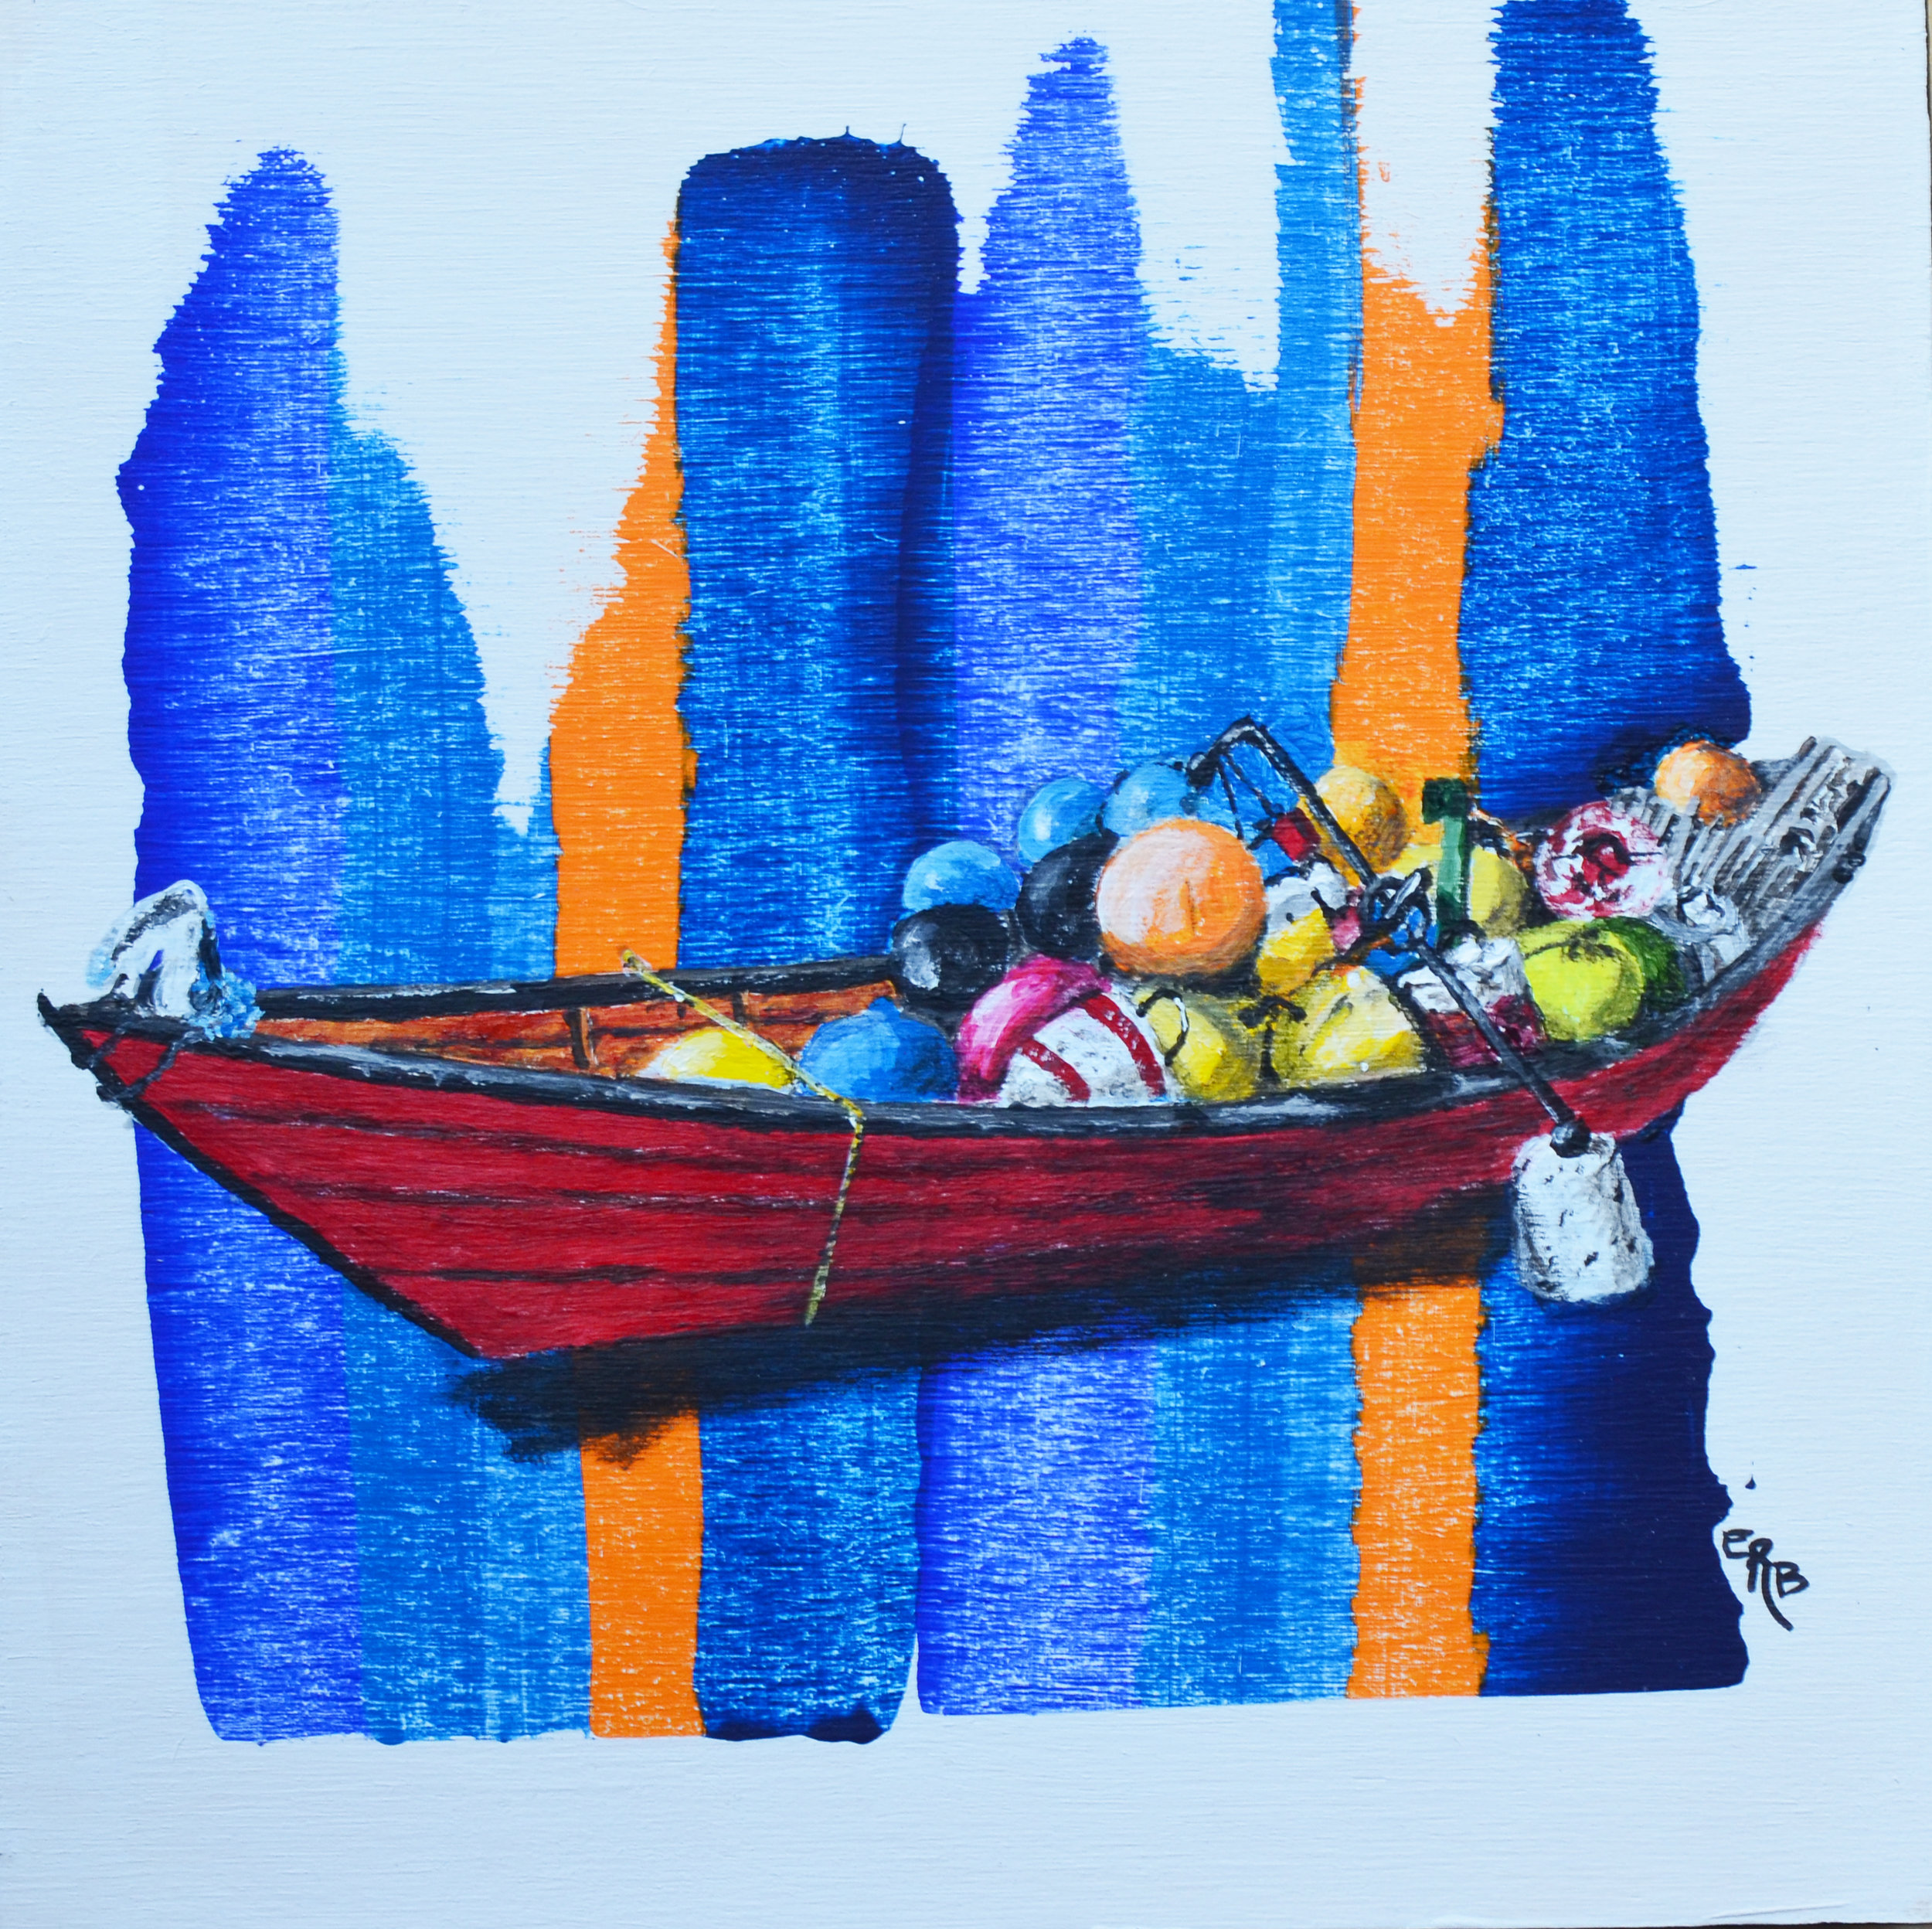 Buoy Boat (Point Prim)